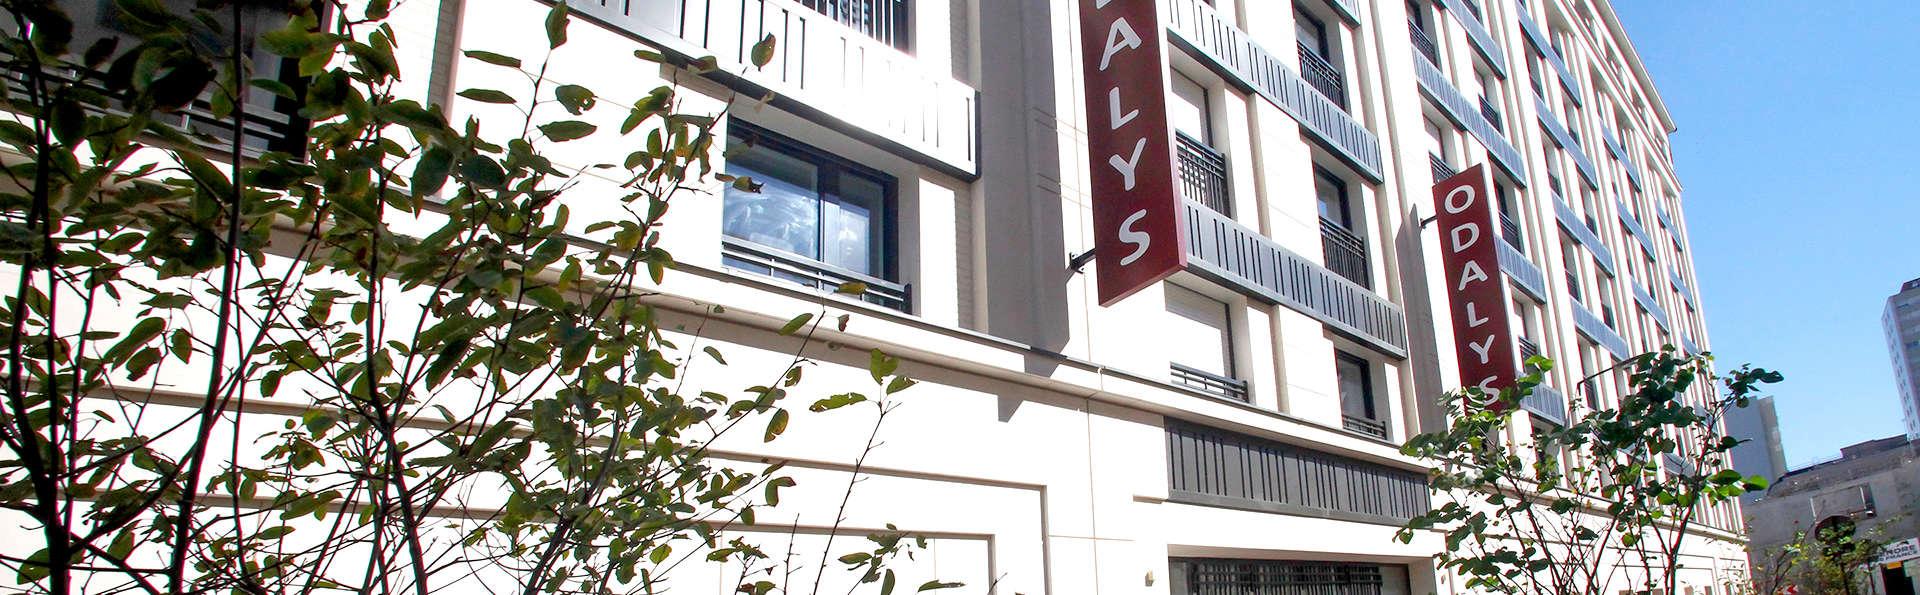 Appart'Hotel Odalys Paris Levallois - Edit_Front2.jpg